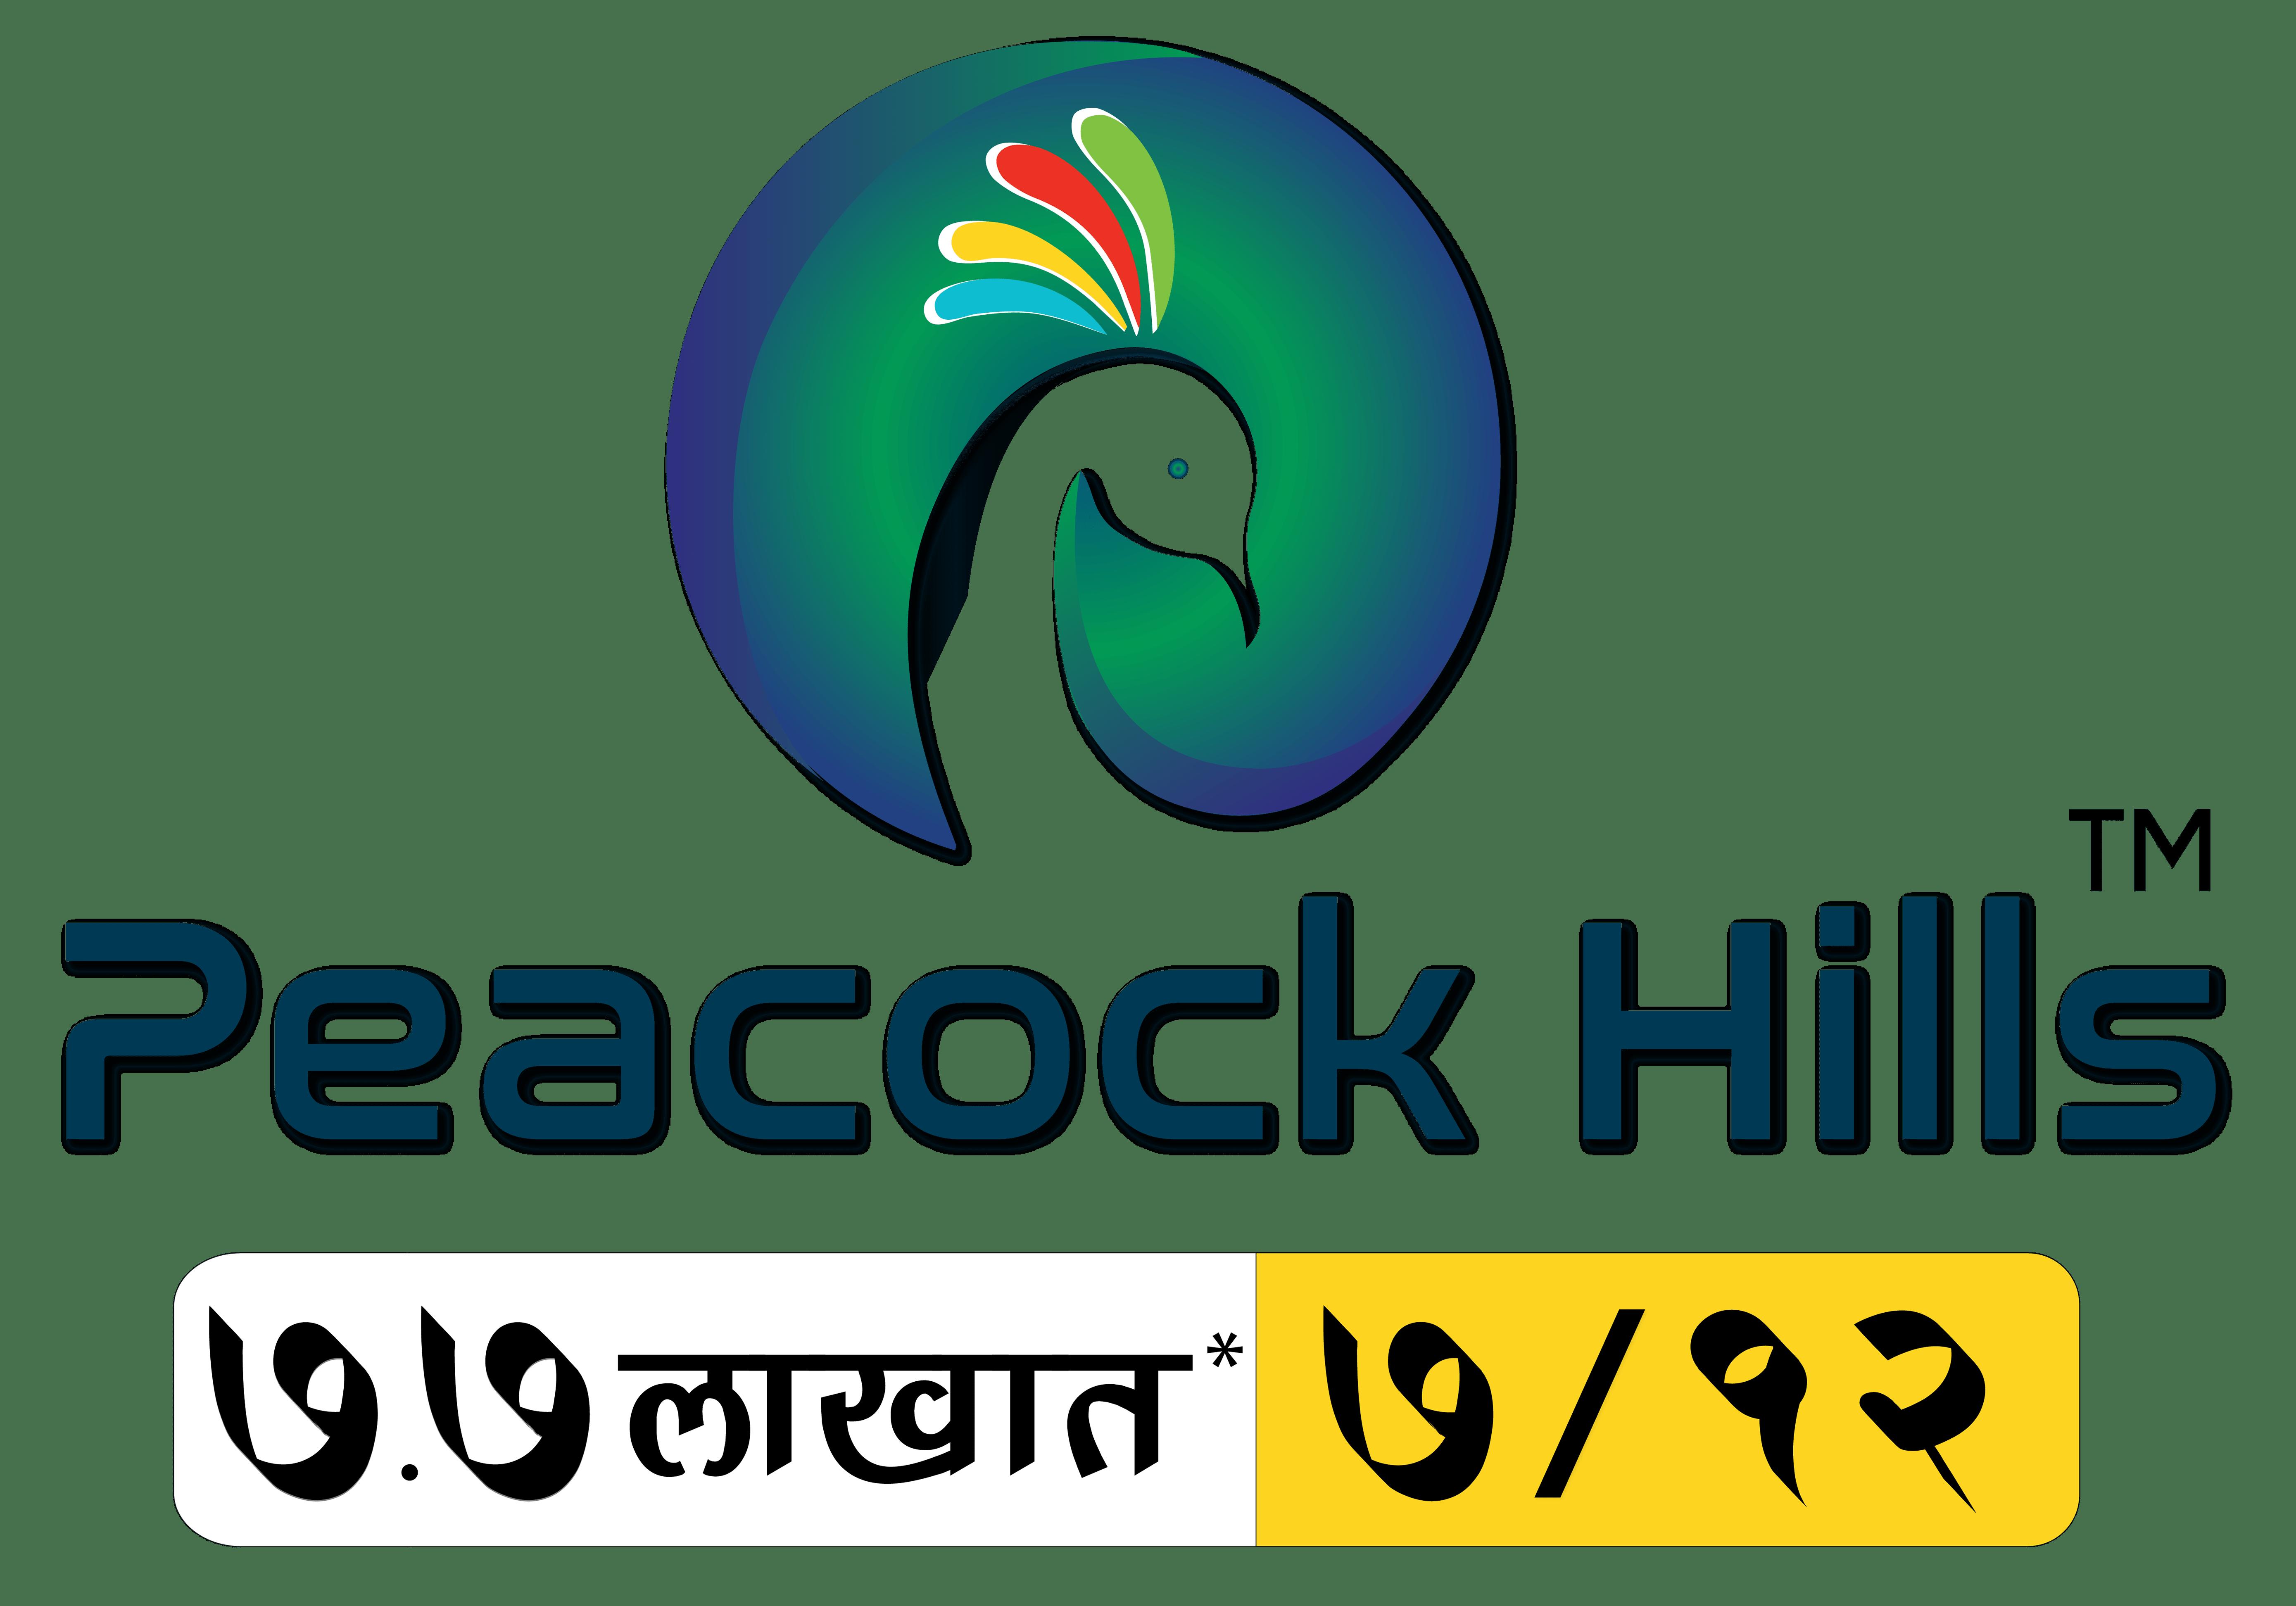 Digital Marketing StudioGenix Case Study - Peacock Hills